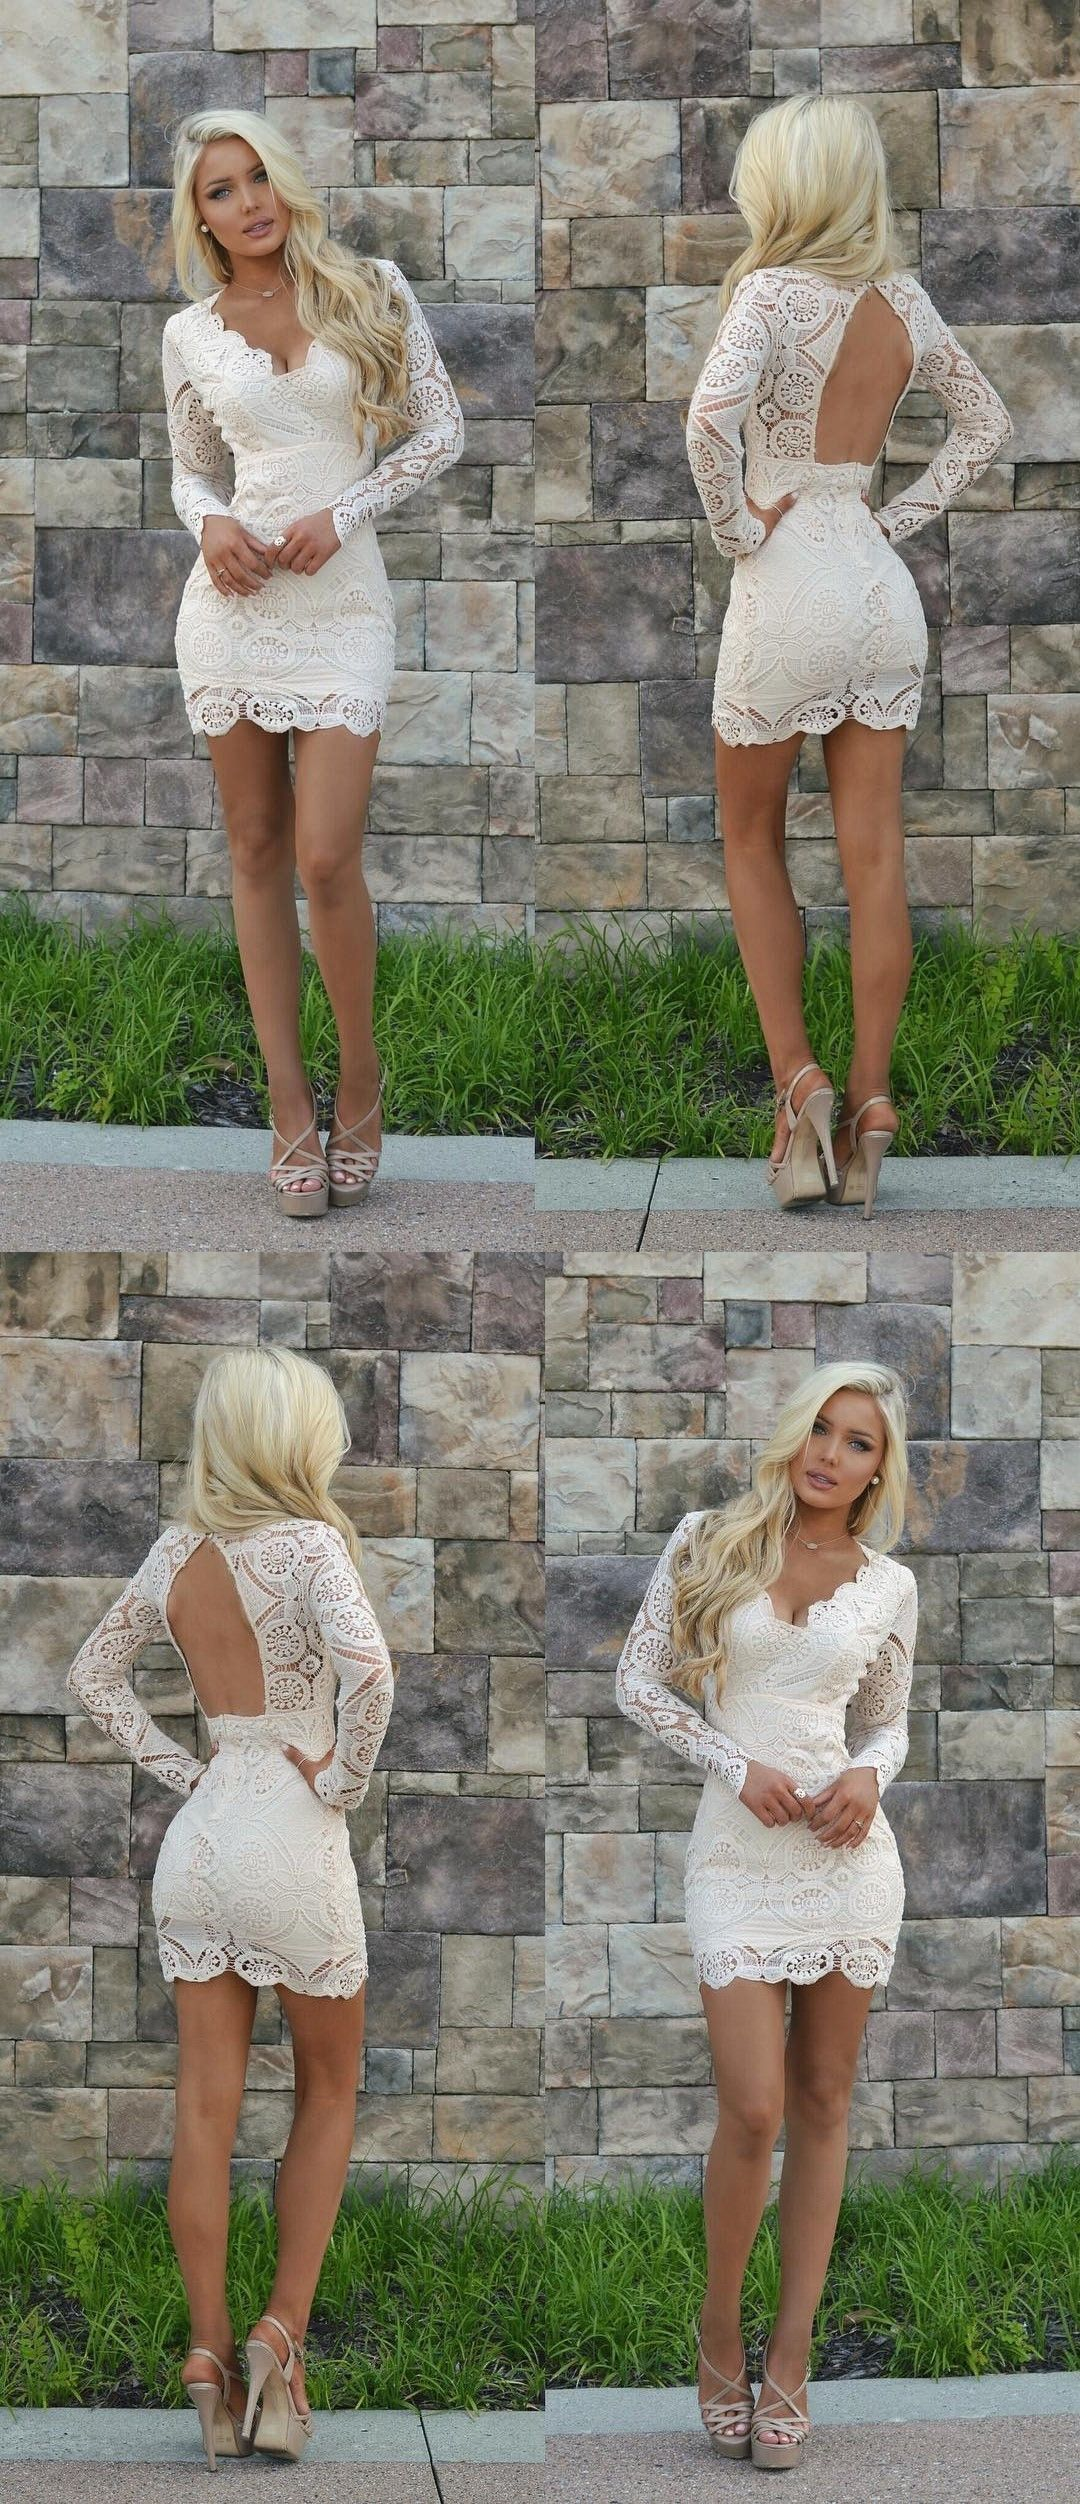 dd52612732 Sheath V-Neck Open Back Long Sleeves White Lace Homecoming Dress